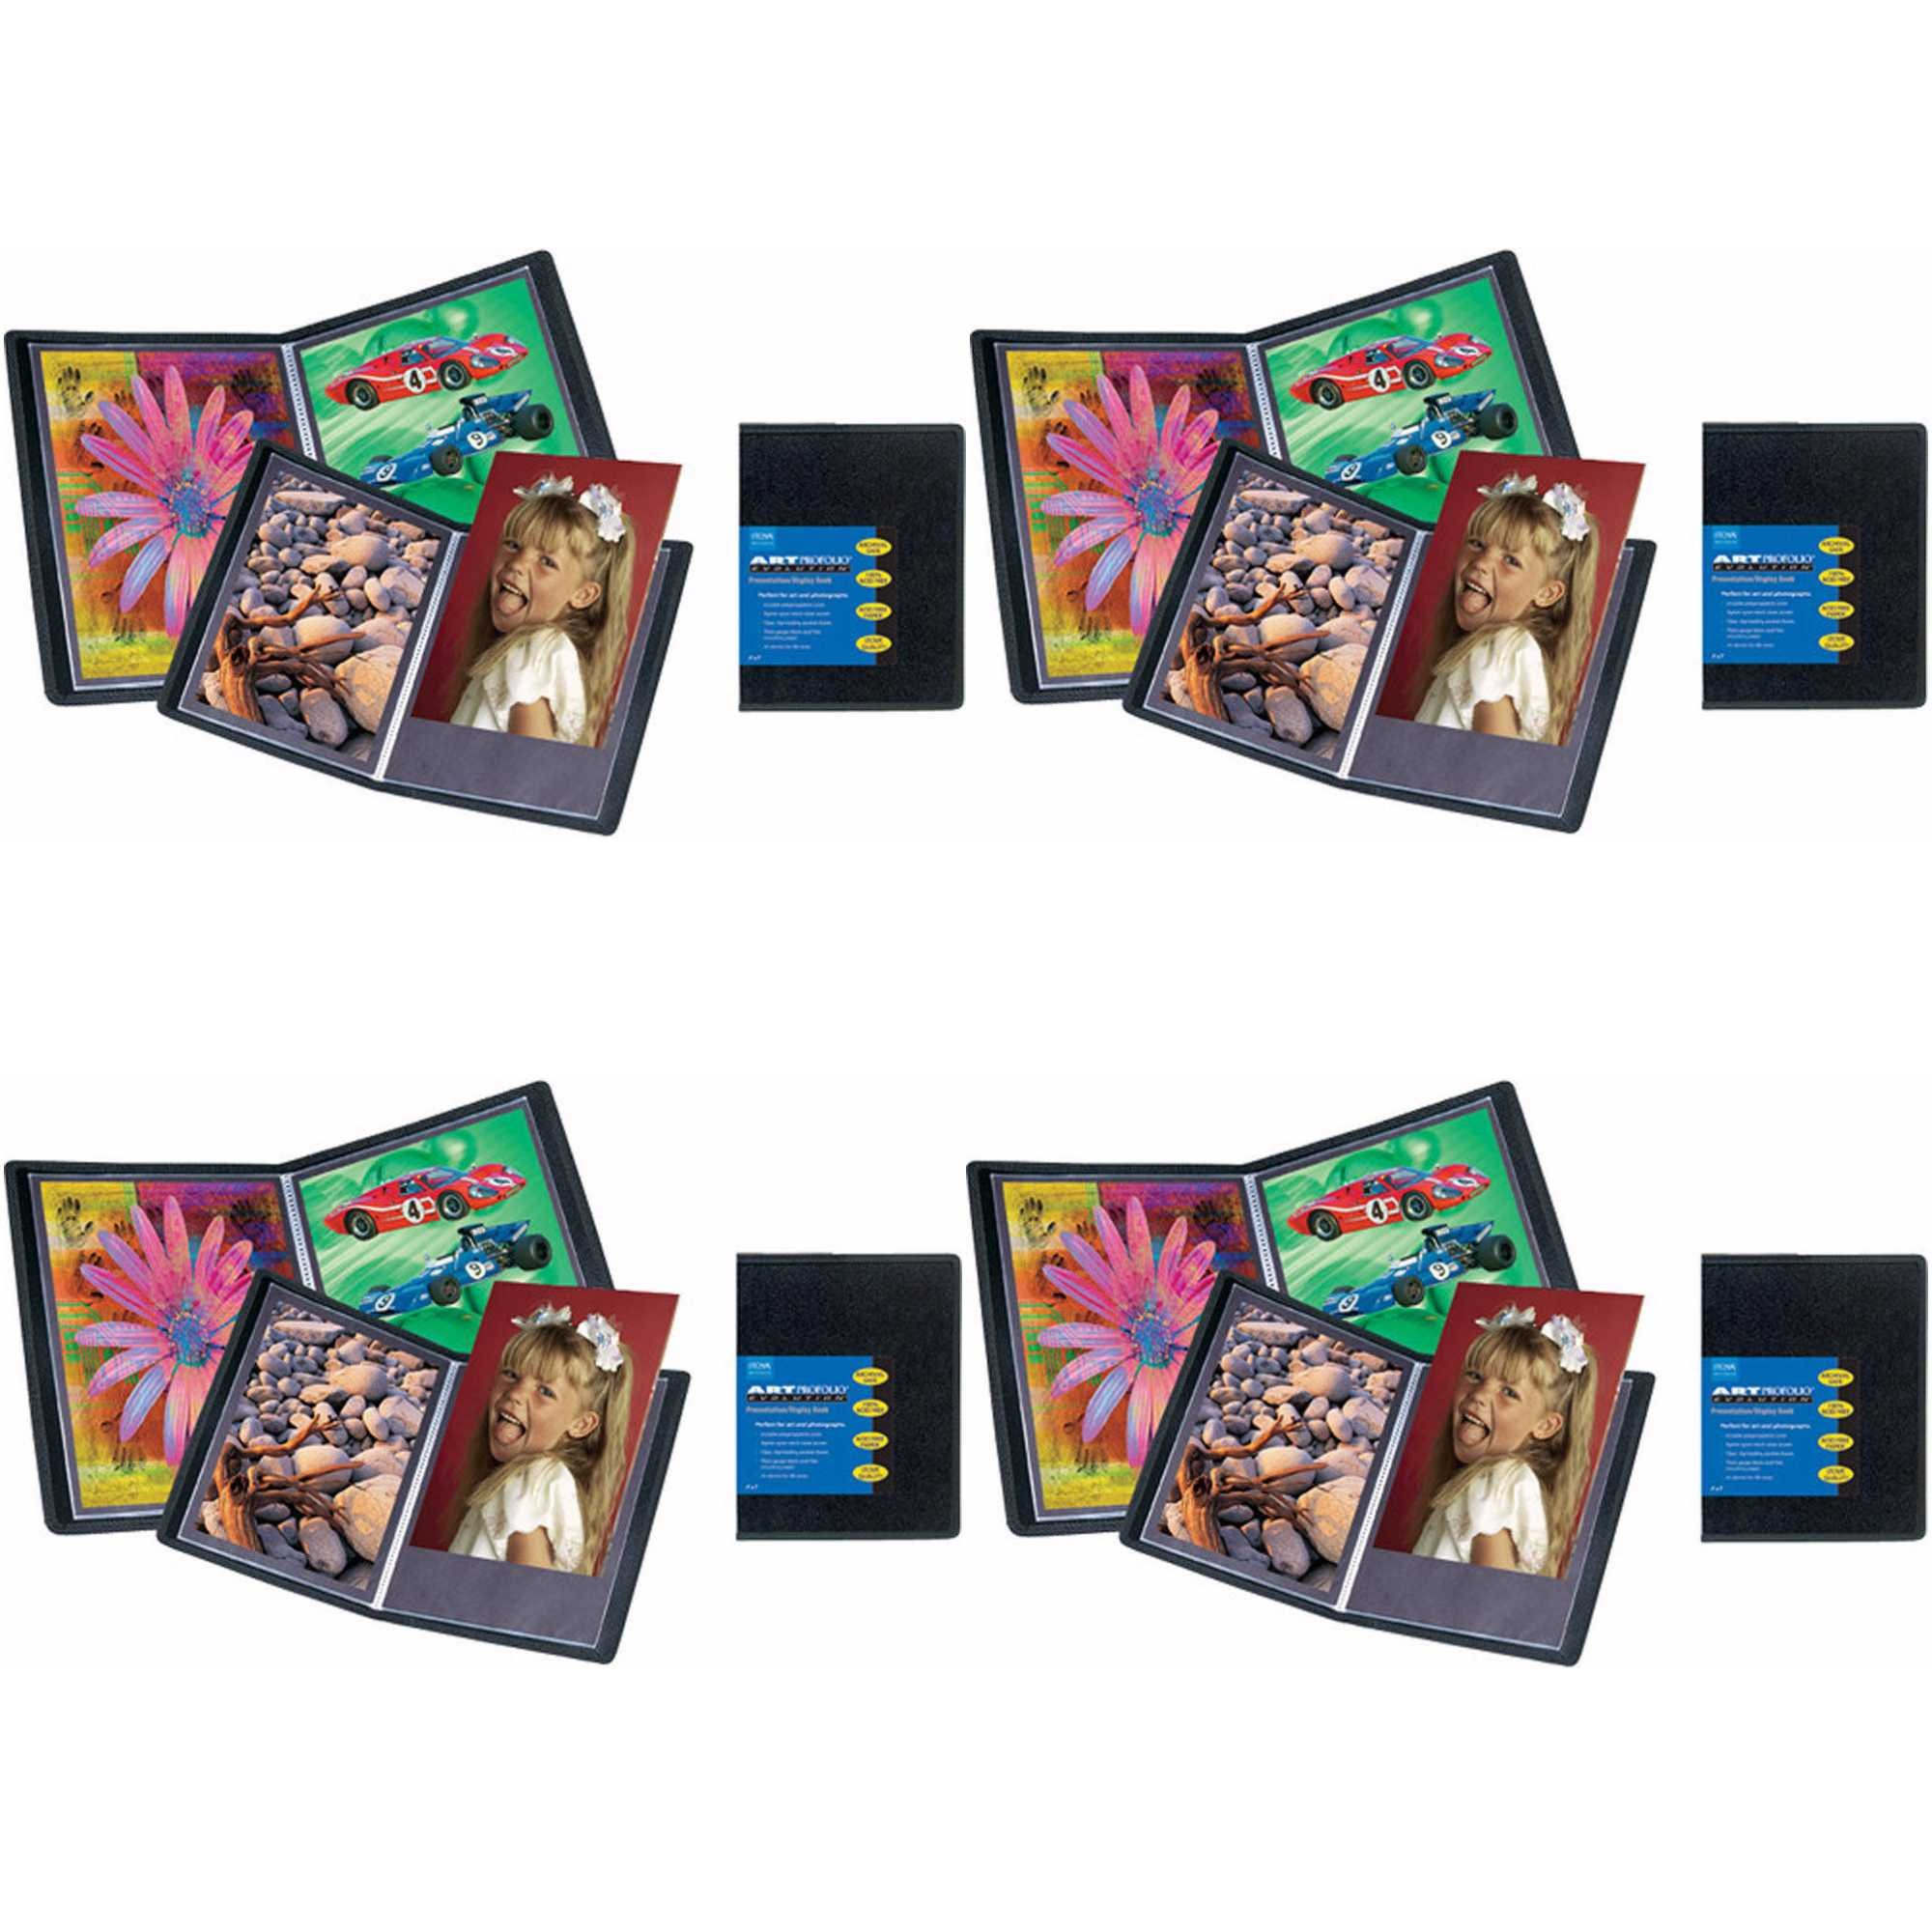 ITOYA Art Profolio Evolution 16'' x 20'' Presentation/Display Book 4-Pack